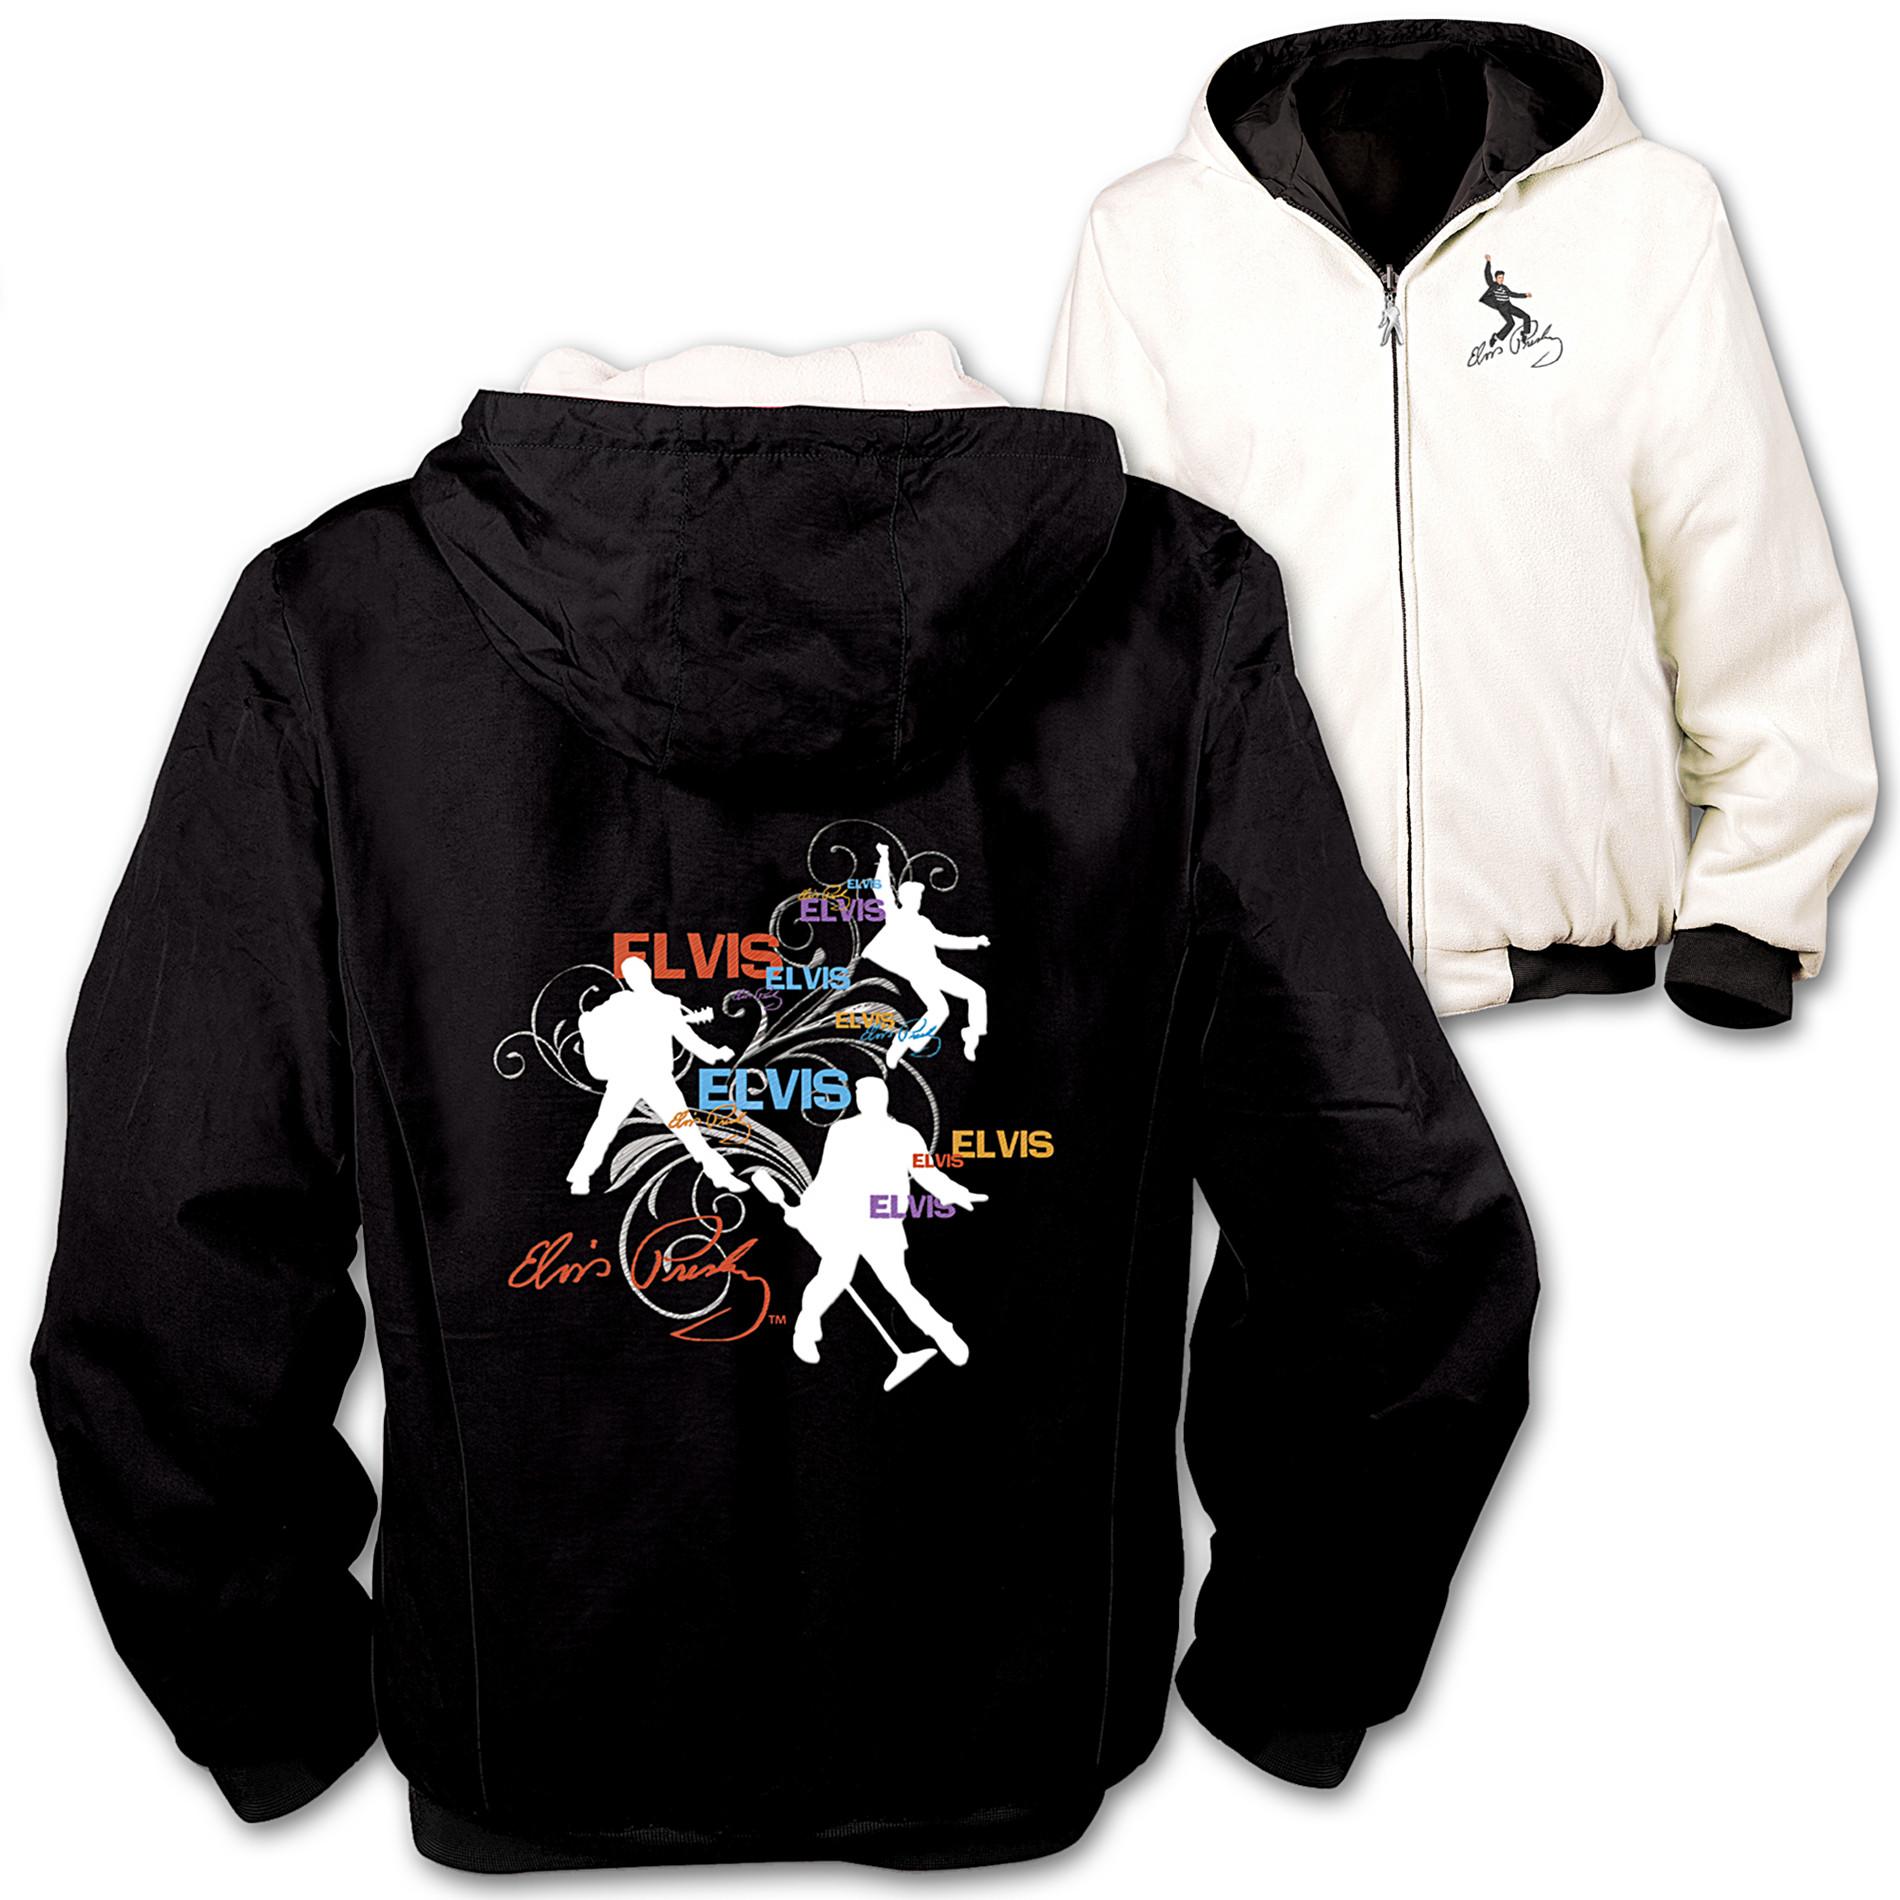 The Bradford Exchange Elvis Presley Reversible Women's Jacket: On The Flip Side at Sears.com